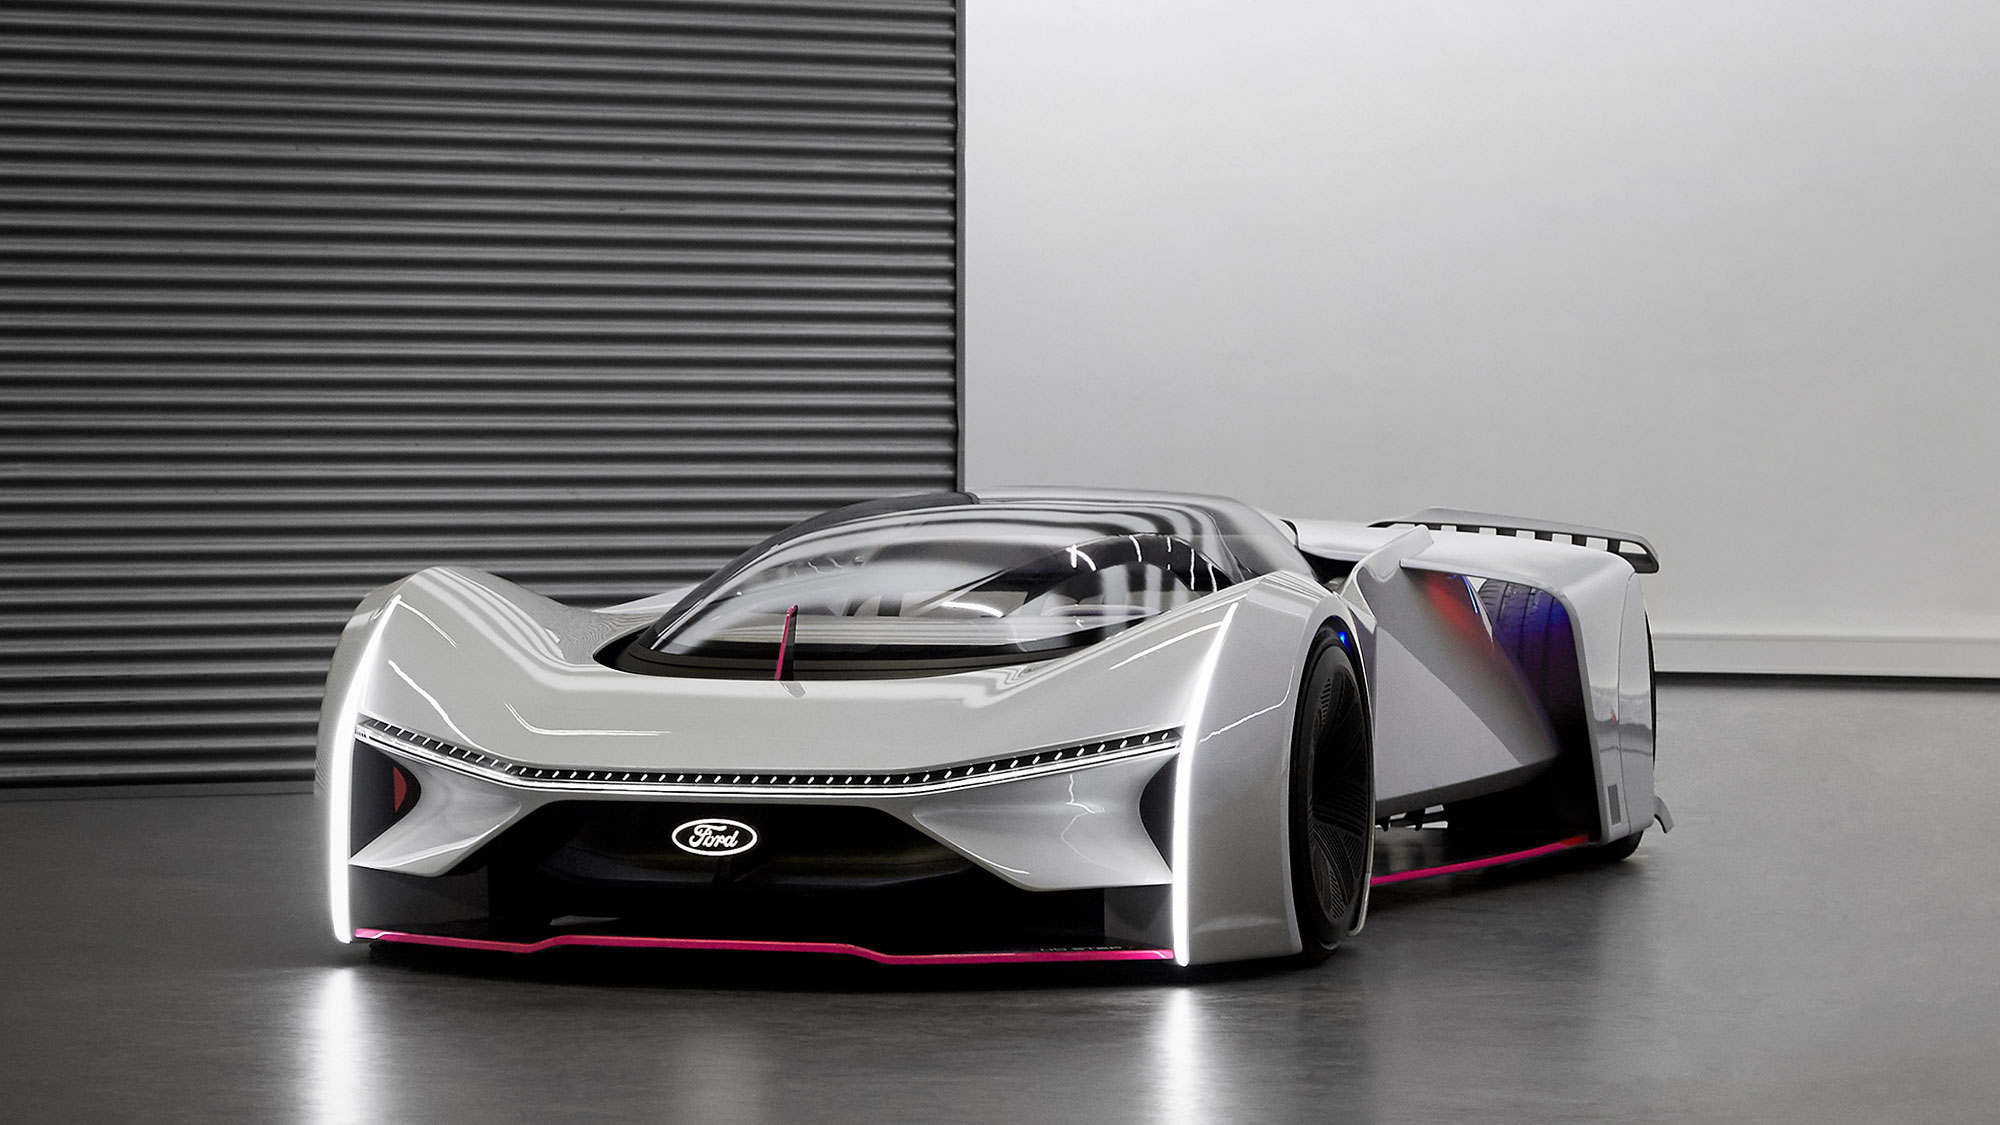 Team Fordzilla P1 Concept Race Car